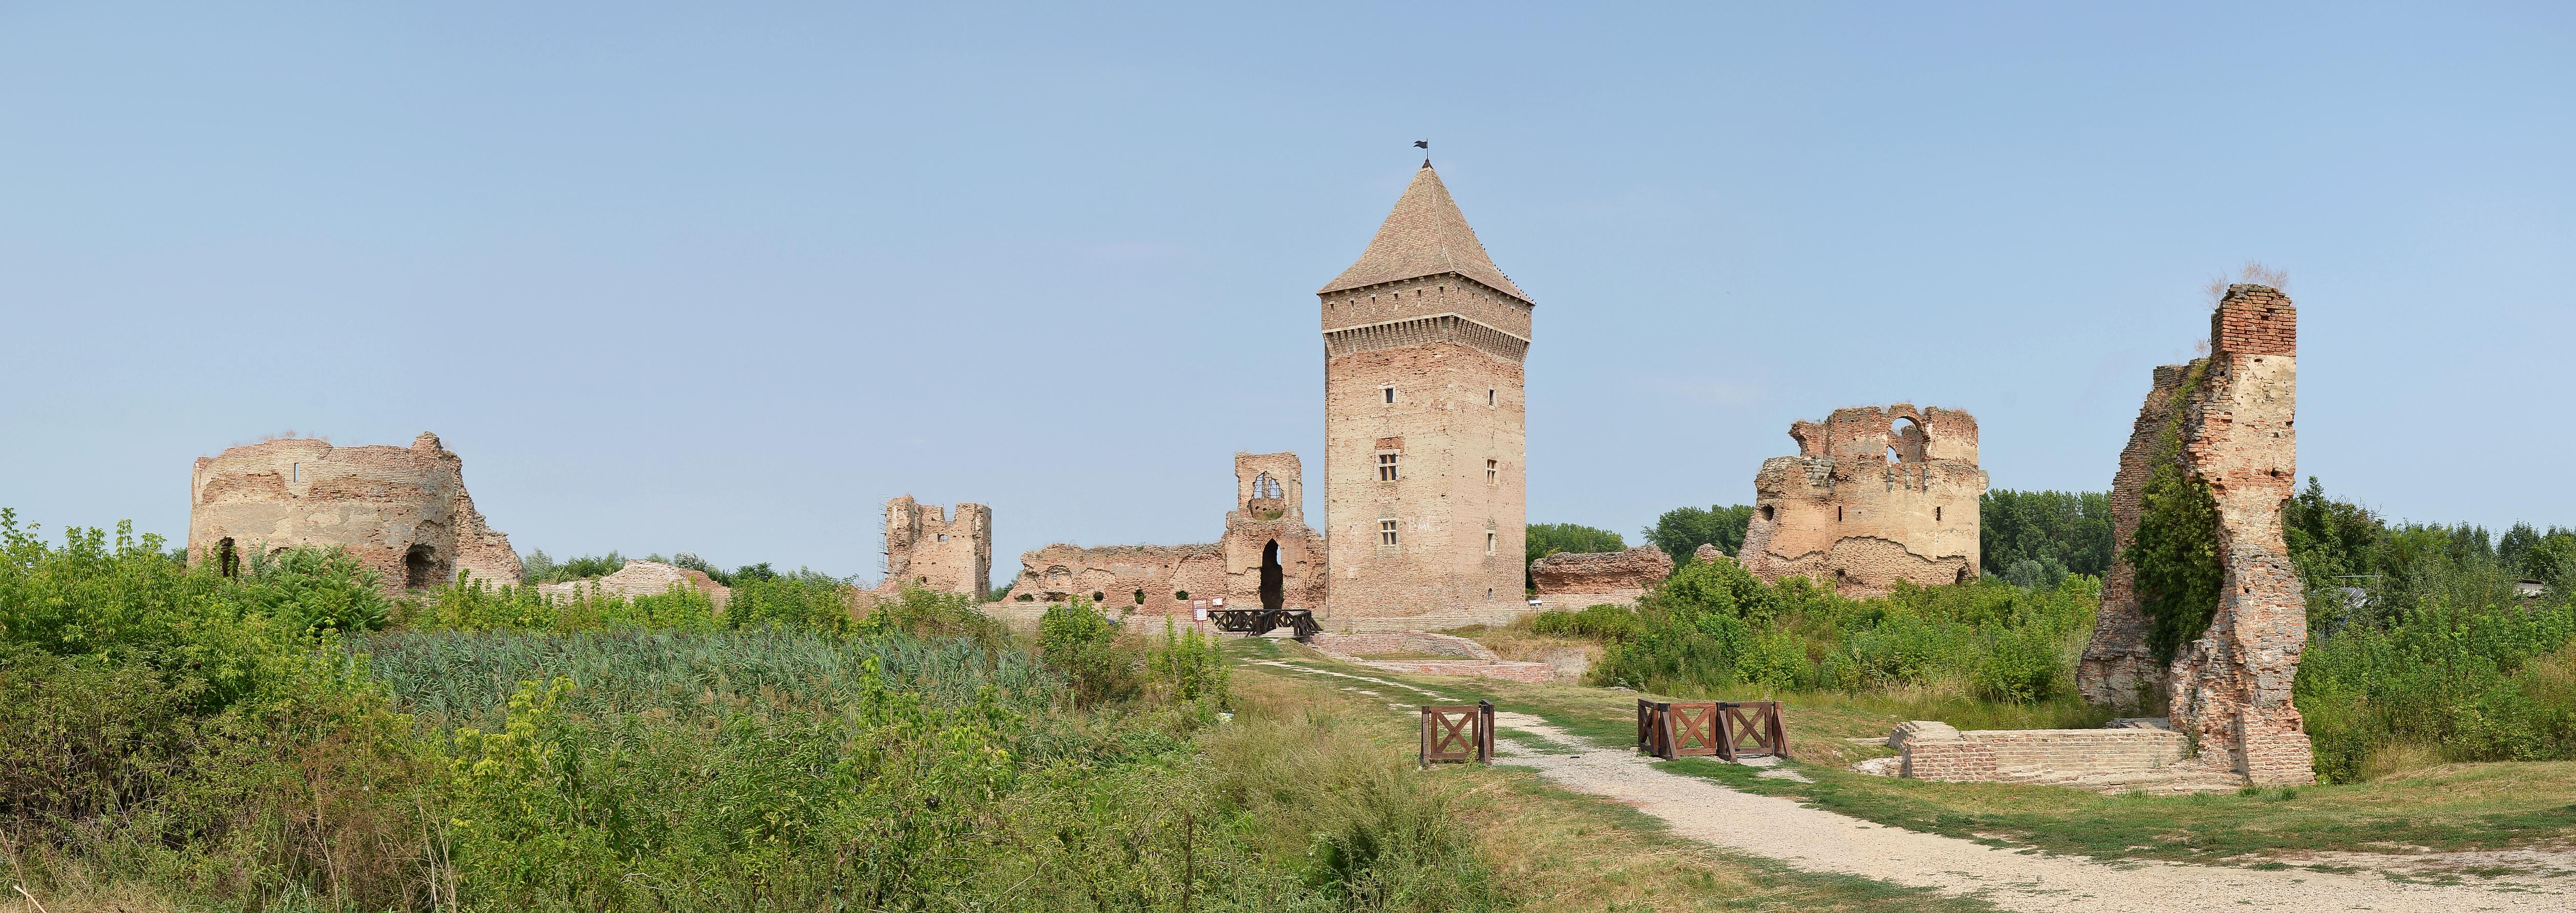 Bač_fortress_(Bačka_tvrđava)